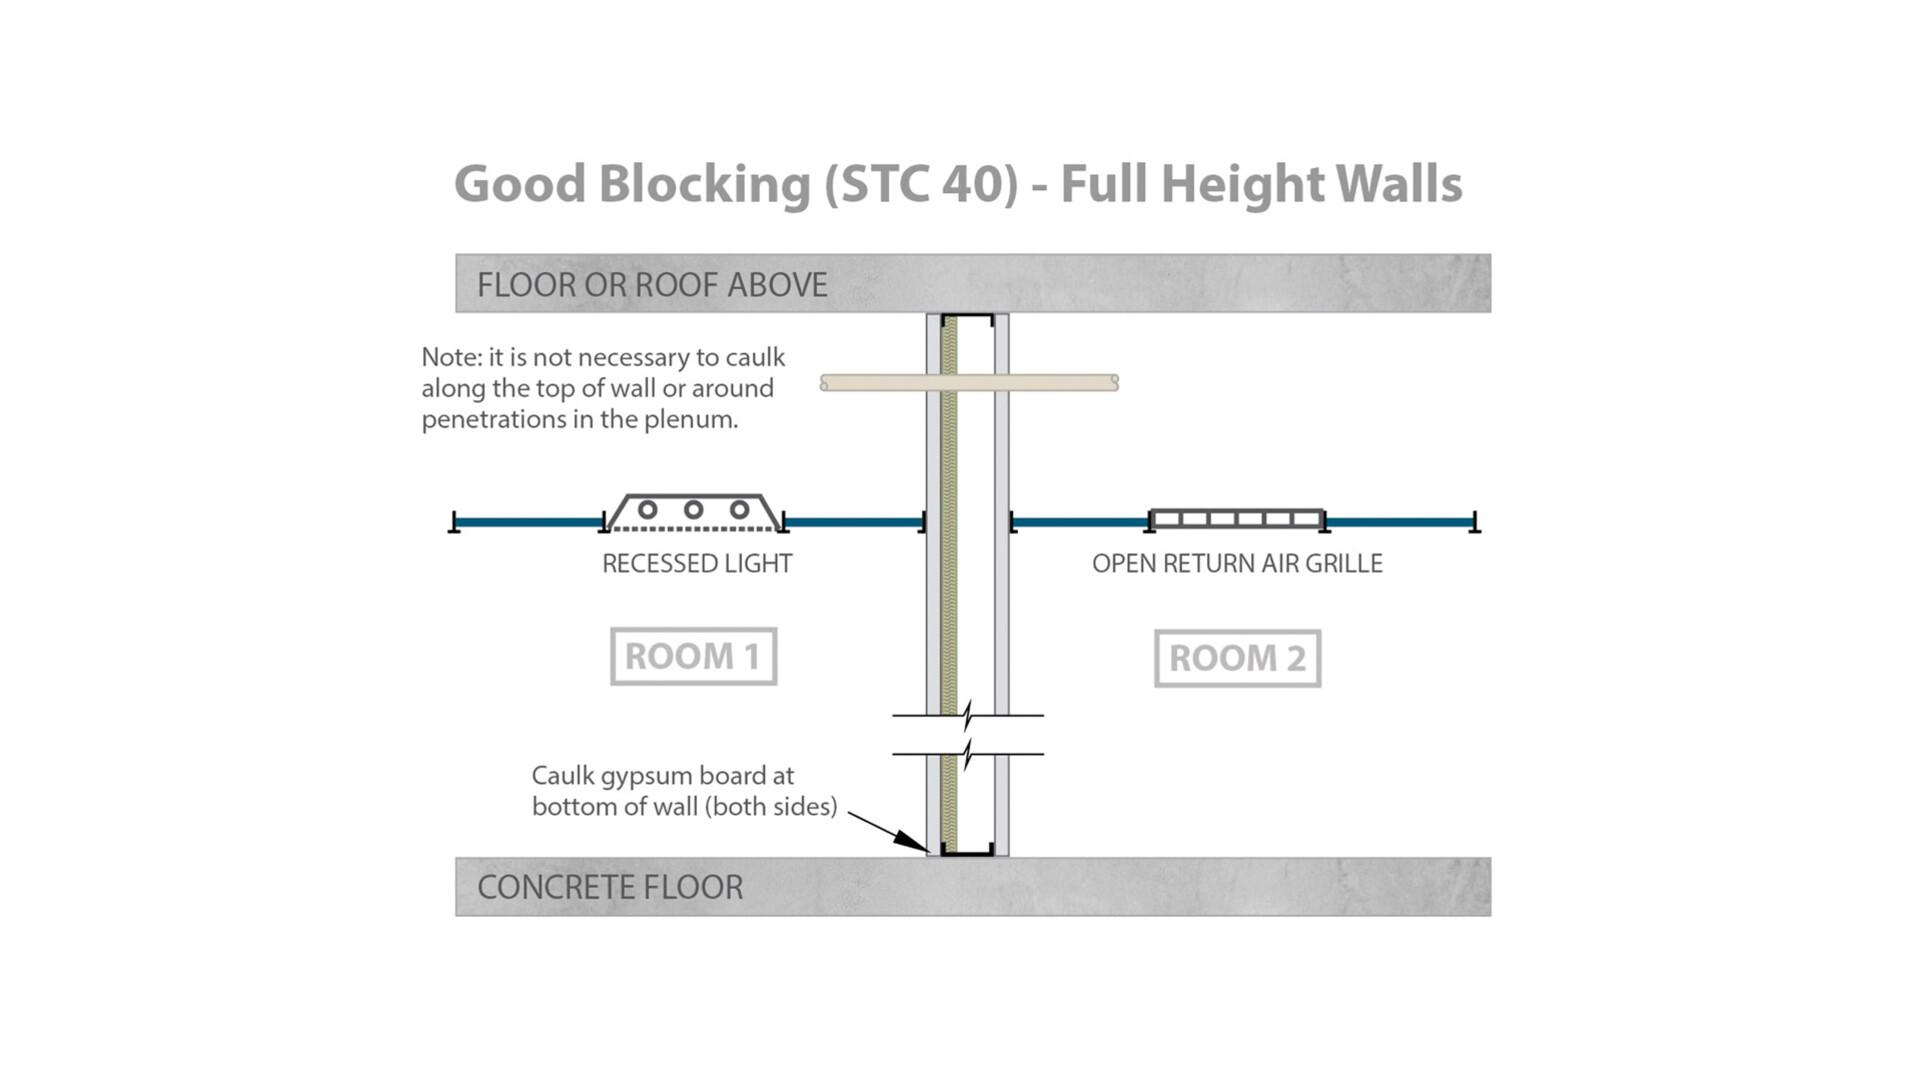 RFN-NA, optimized acoustics, good sound blocking, STC 40 full height walls